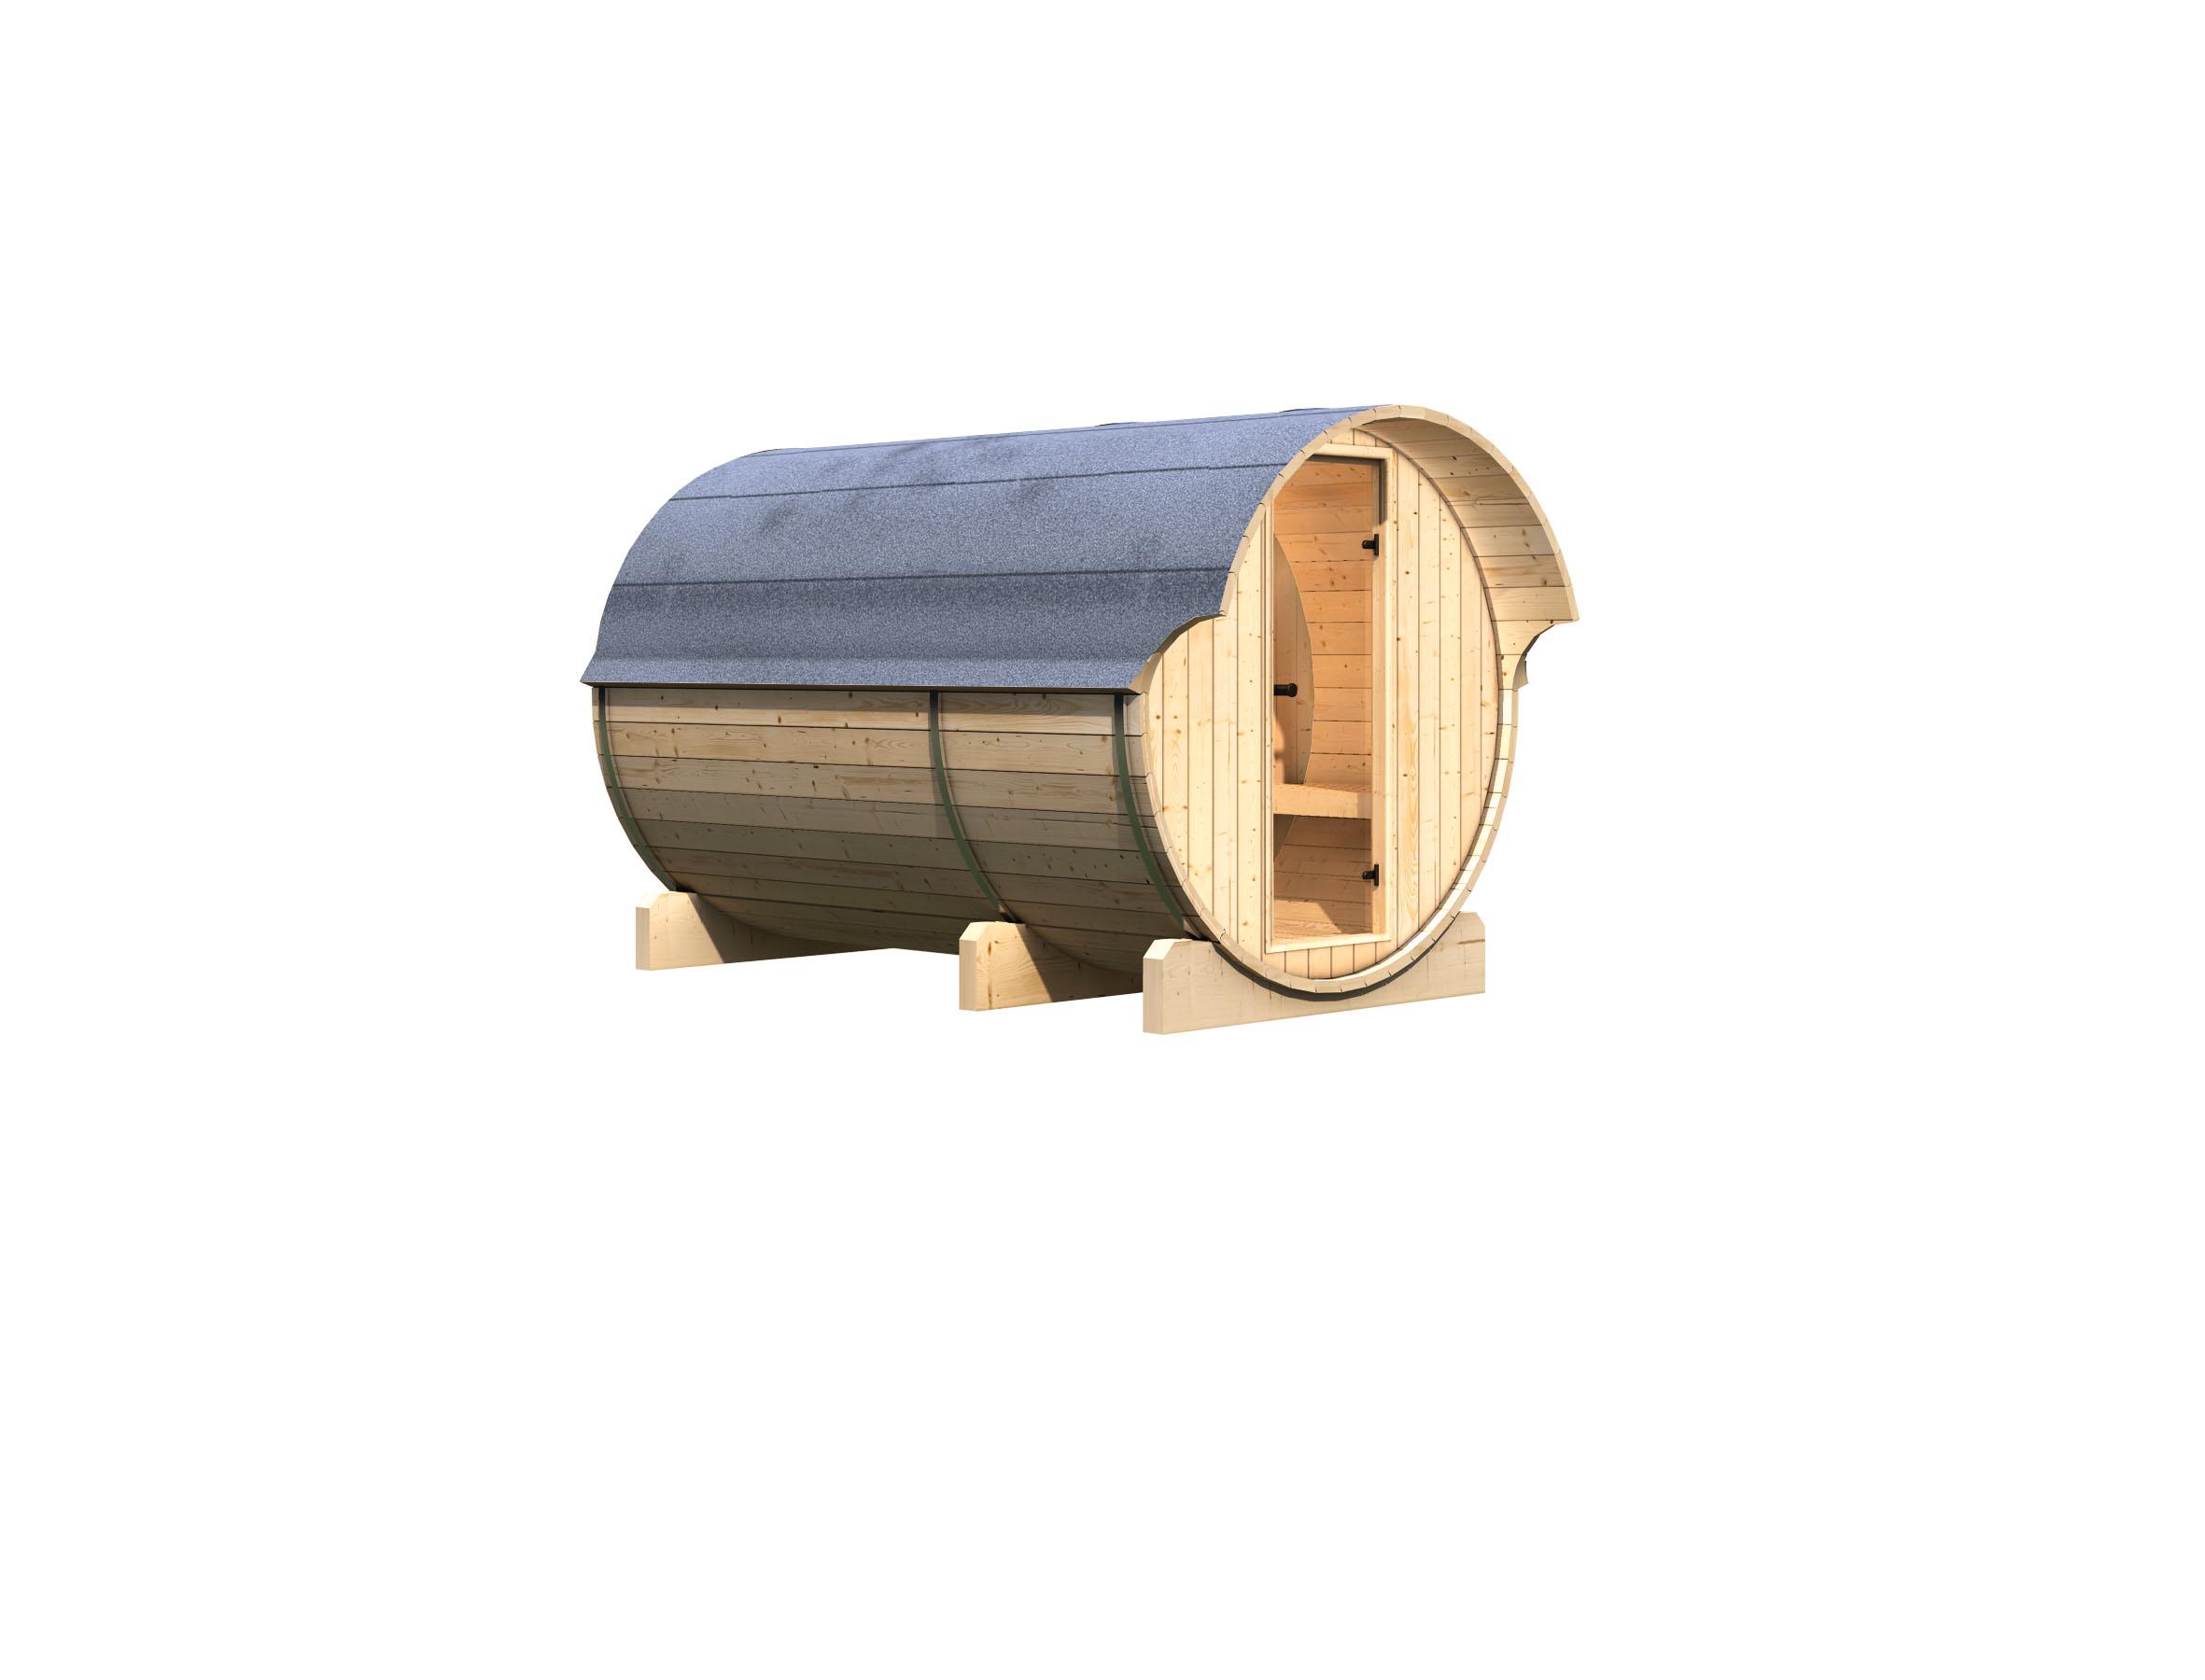 karibu fass sauna 3 welche sauna kaufen. Black Bedroom Furniture Sets. Home Design Ideas